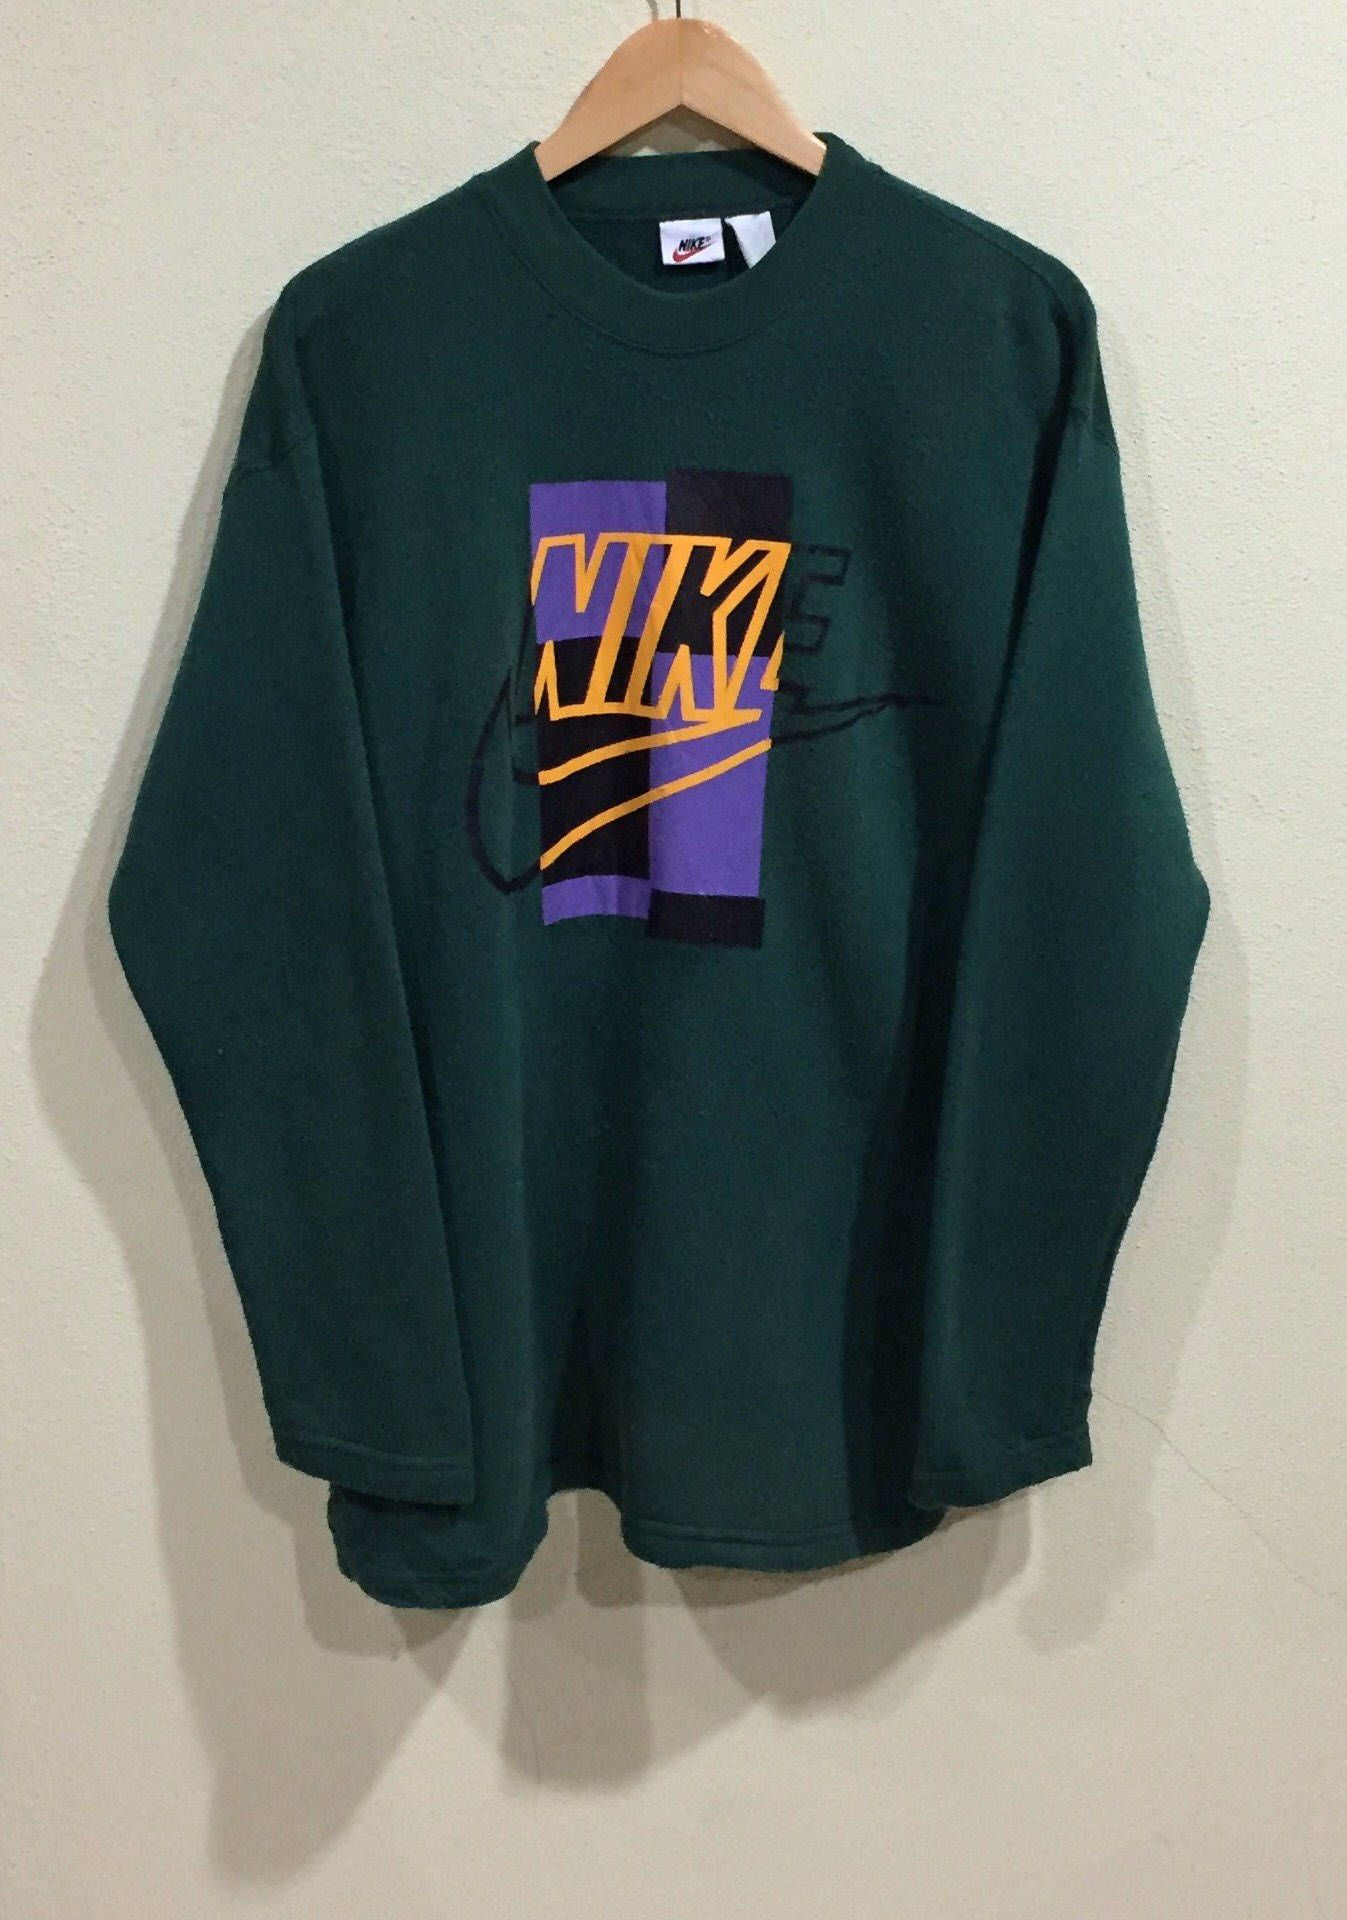 Rare Vintage Nike Sweatshirt Long Sleeve Nike Big Logo Vintage Nike Sweatshirt Hoodie Fashion Retro Outfits [ 1920 x 1347 Pixel ]